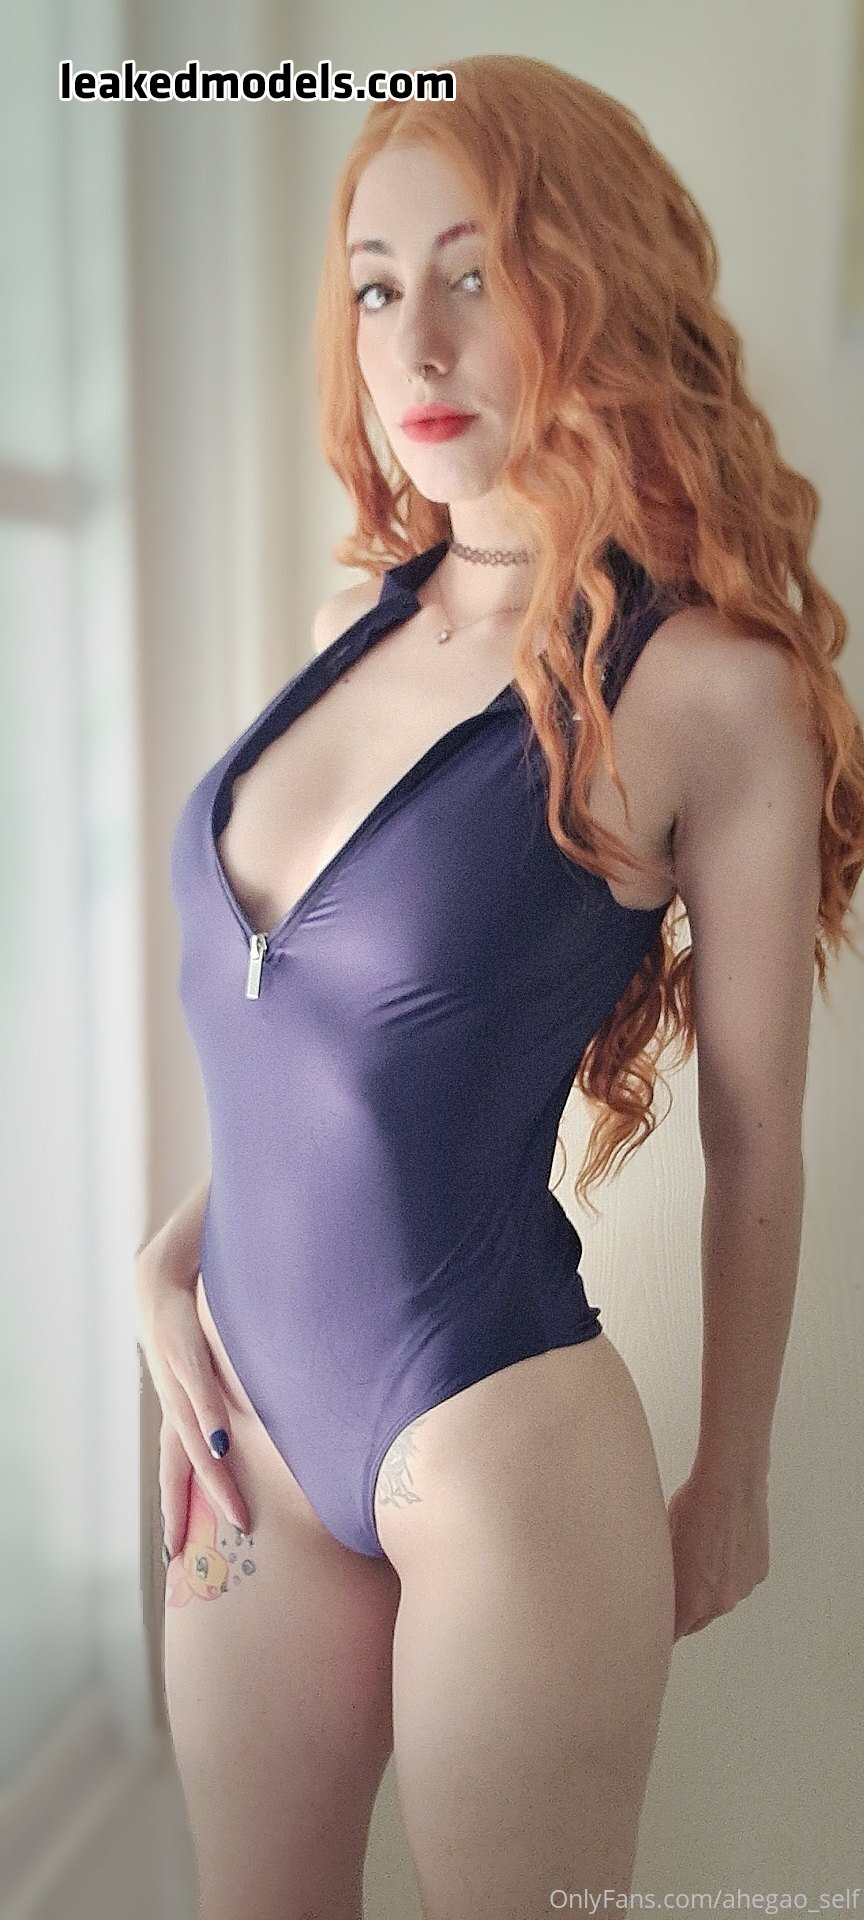 Amber Katz – Ahegao_self OnlyFans Nude Leaks (25 Photos)